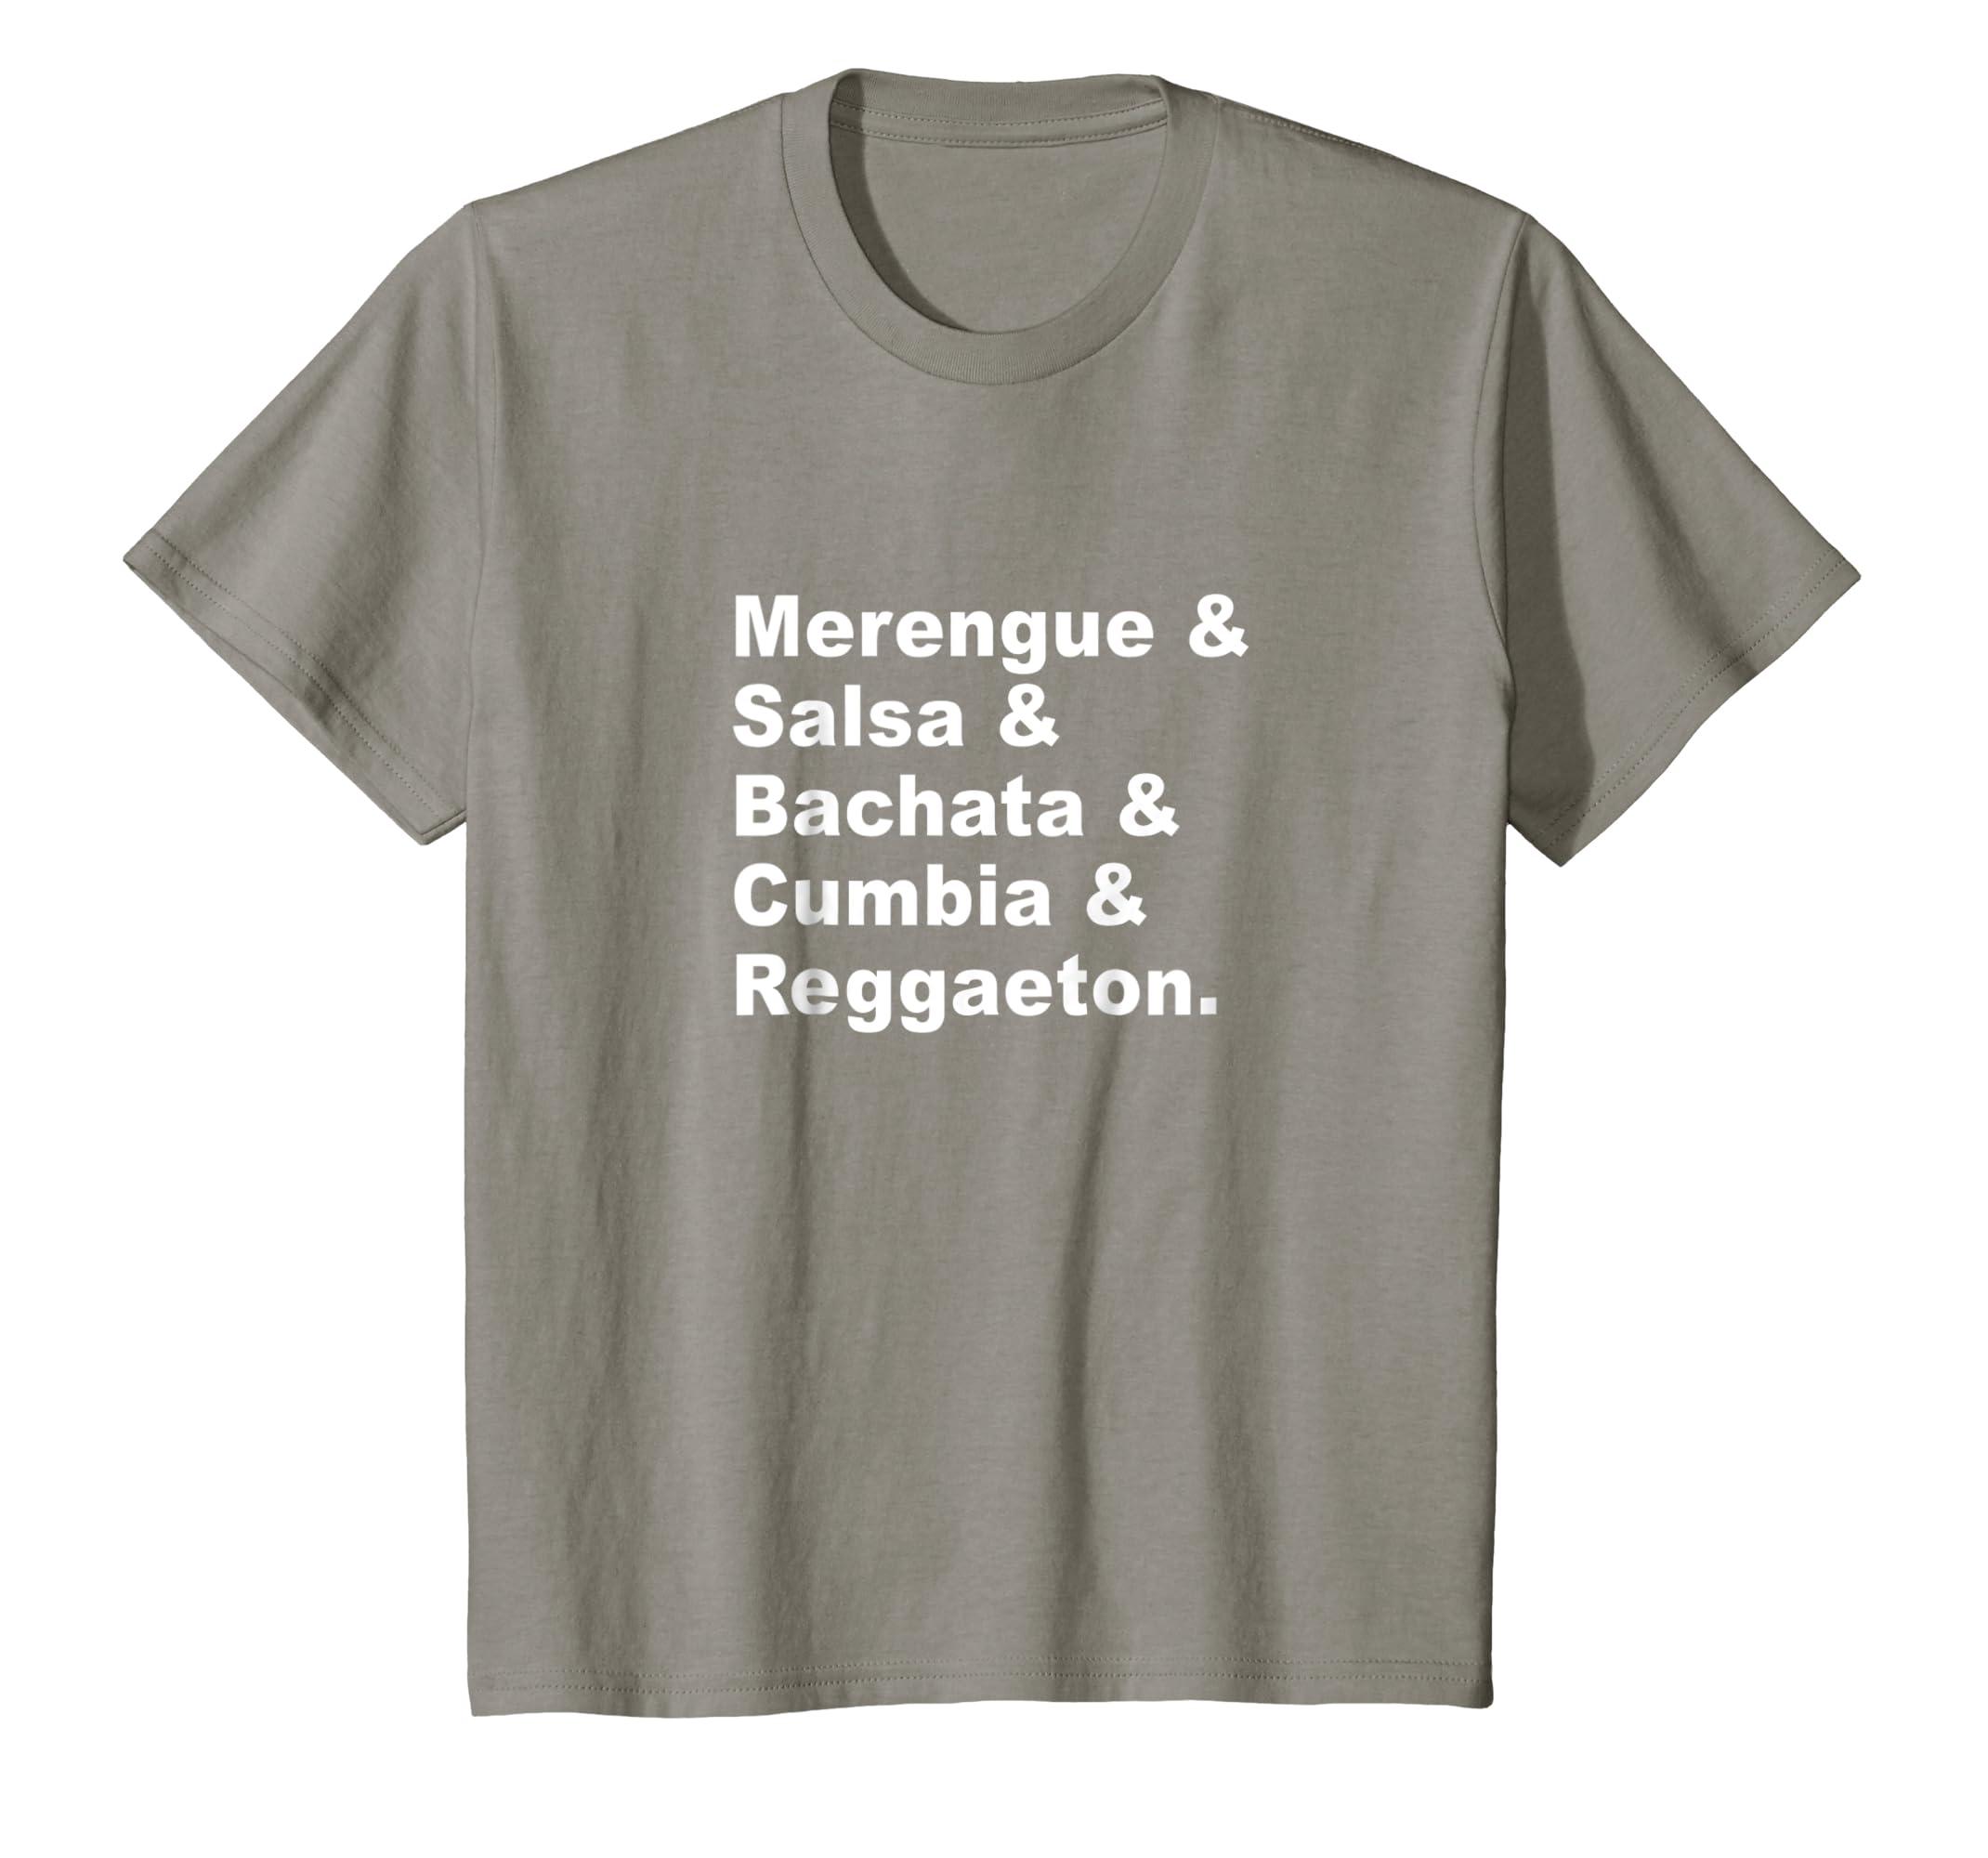 Amazon.com: Merengue Salsa Bachata Cumbia Reggaeton Latin Music Shirt: Clothing